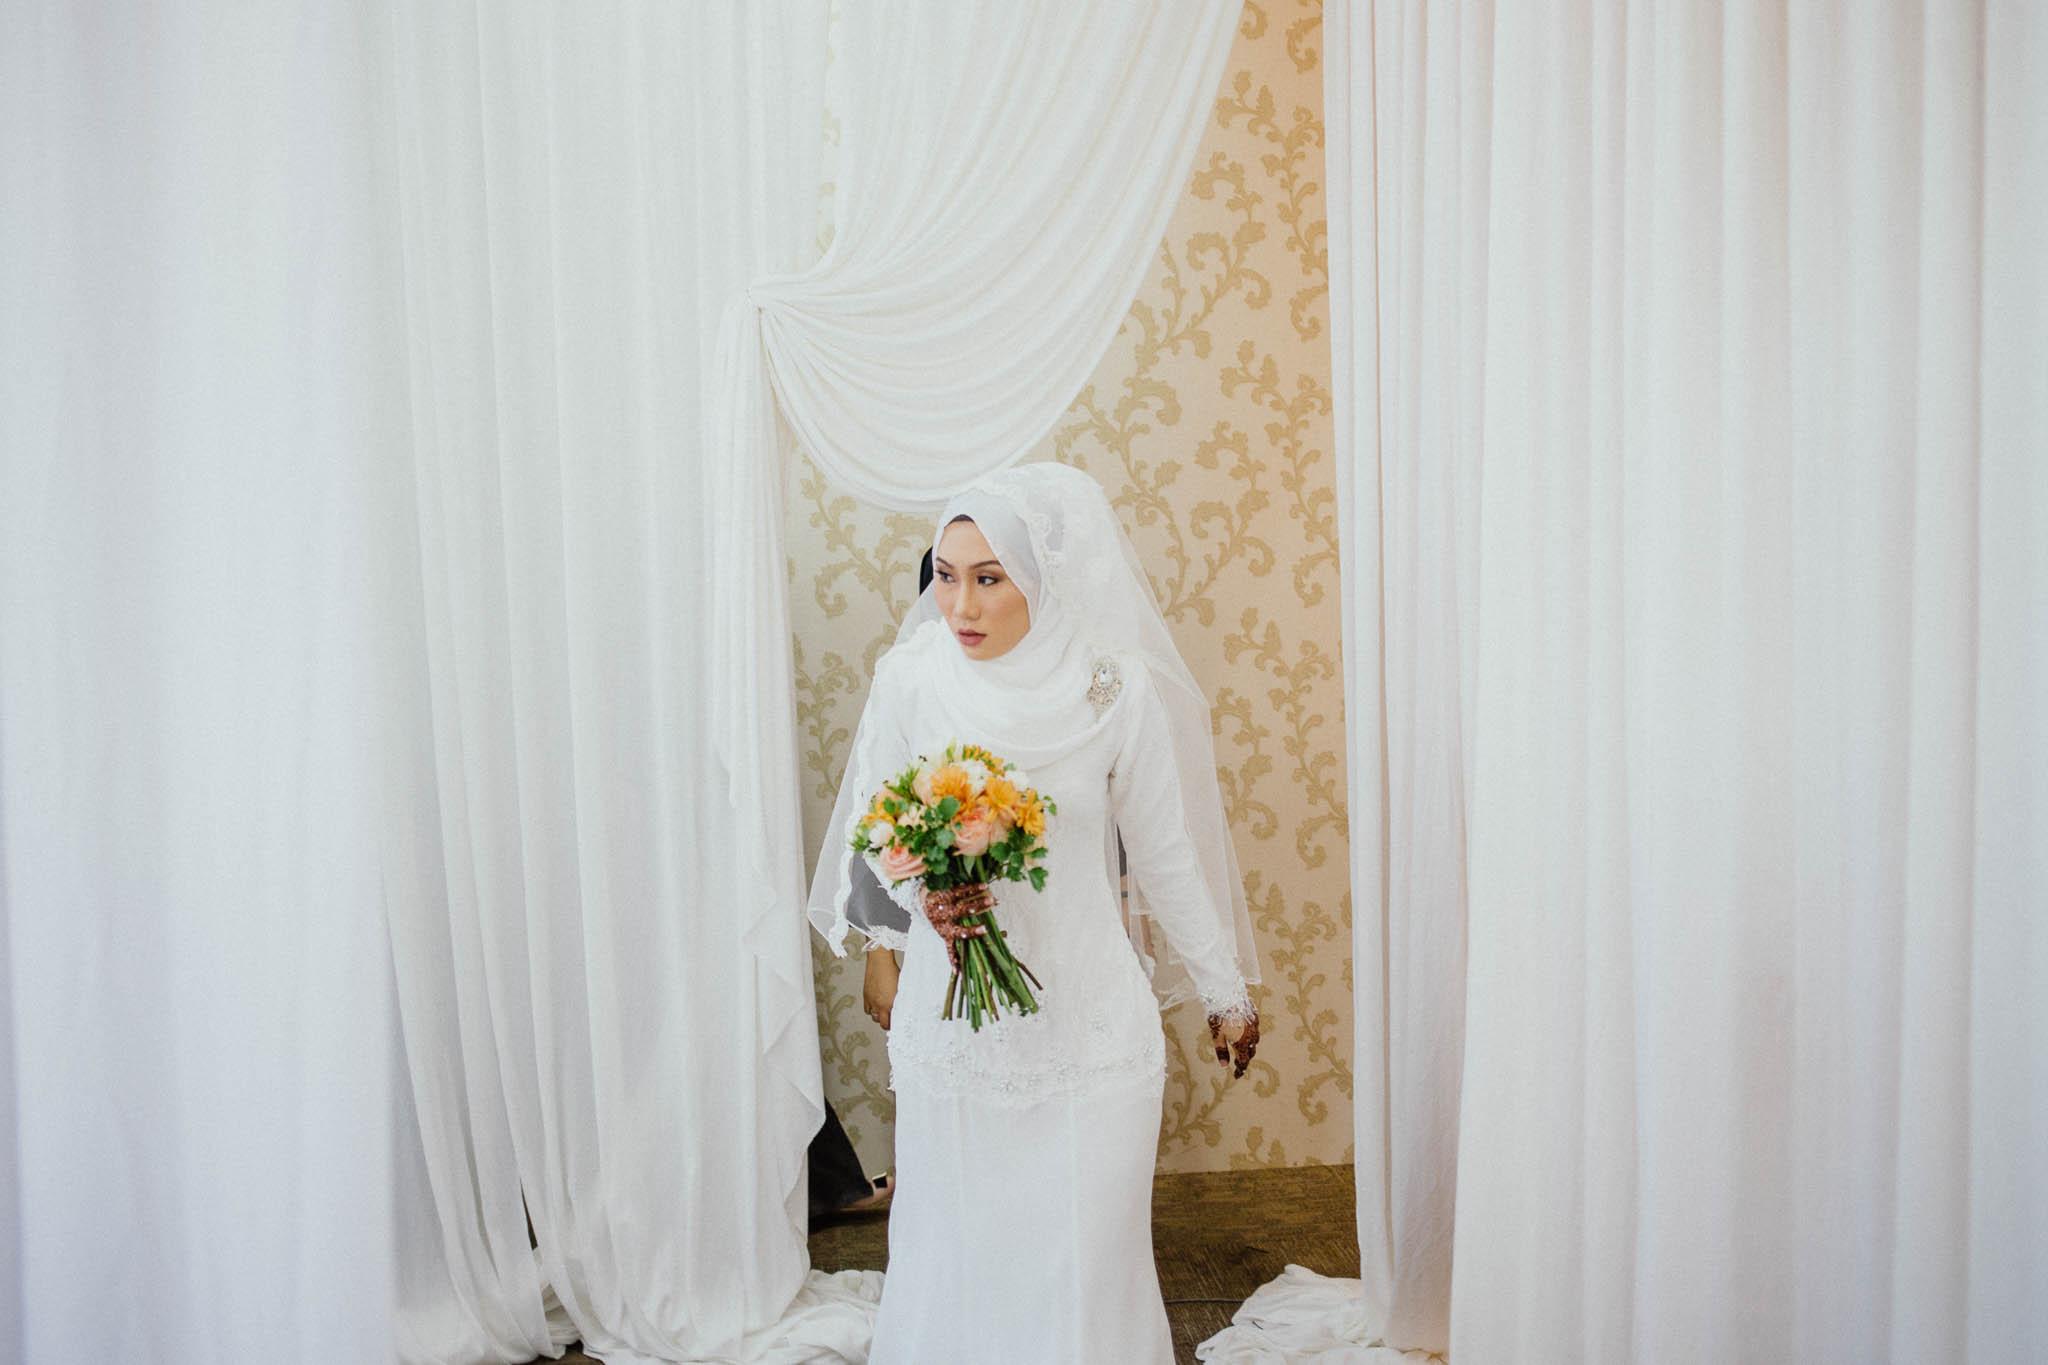 singapore-wedding-photographer-addafiq-nufail-014.jpg